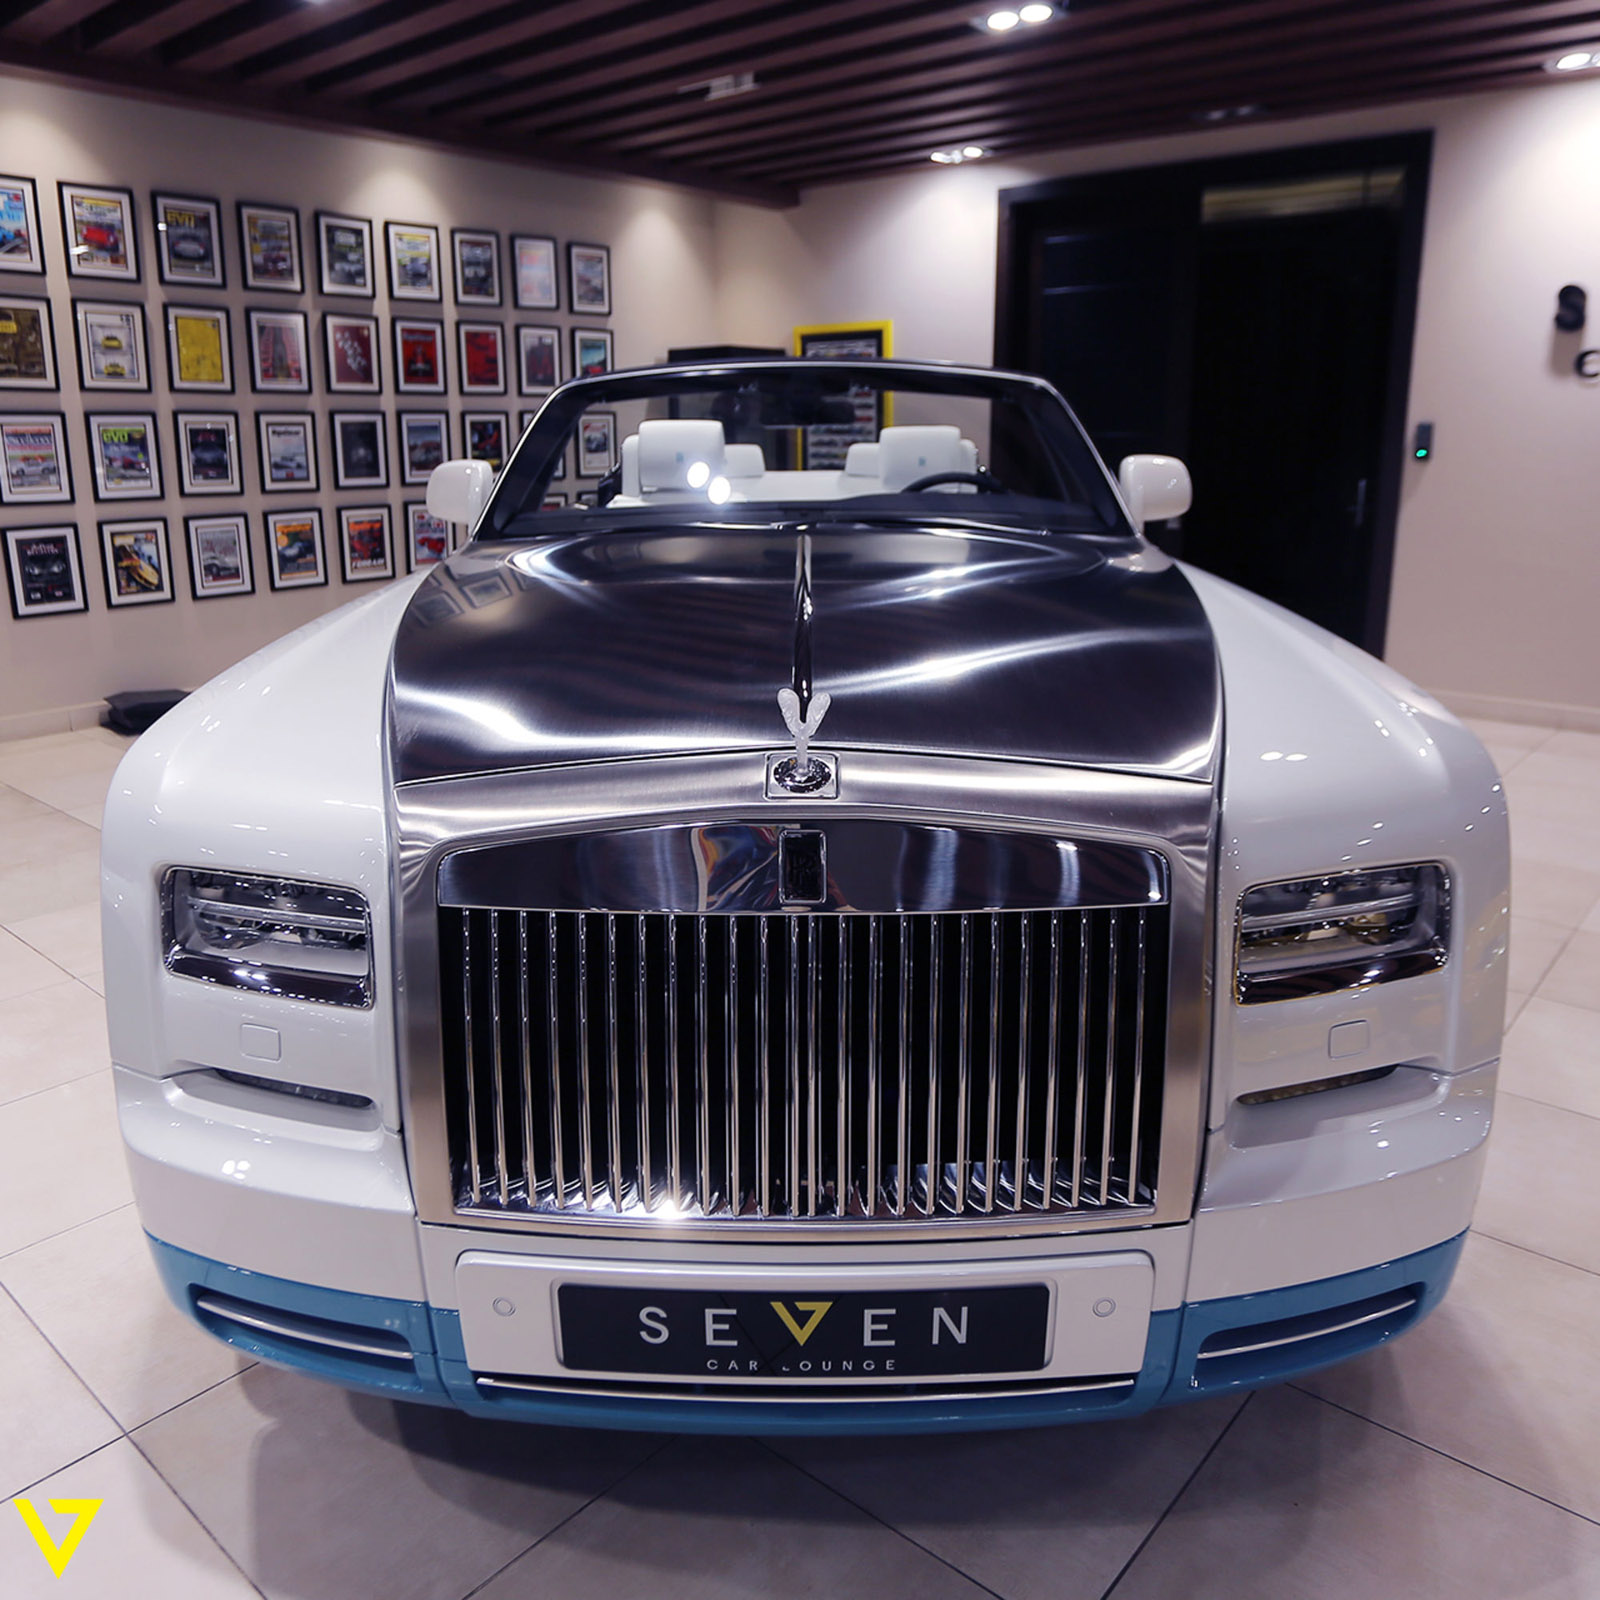 Rolls-Royce_Phantom_Drophead_Coupe_Last-of-Last_edition_04